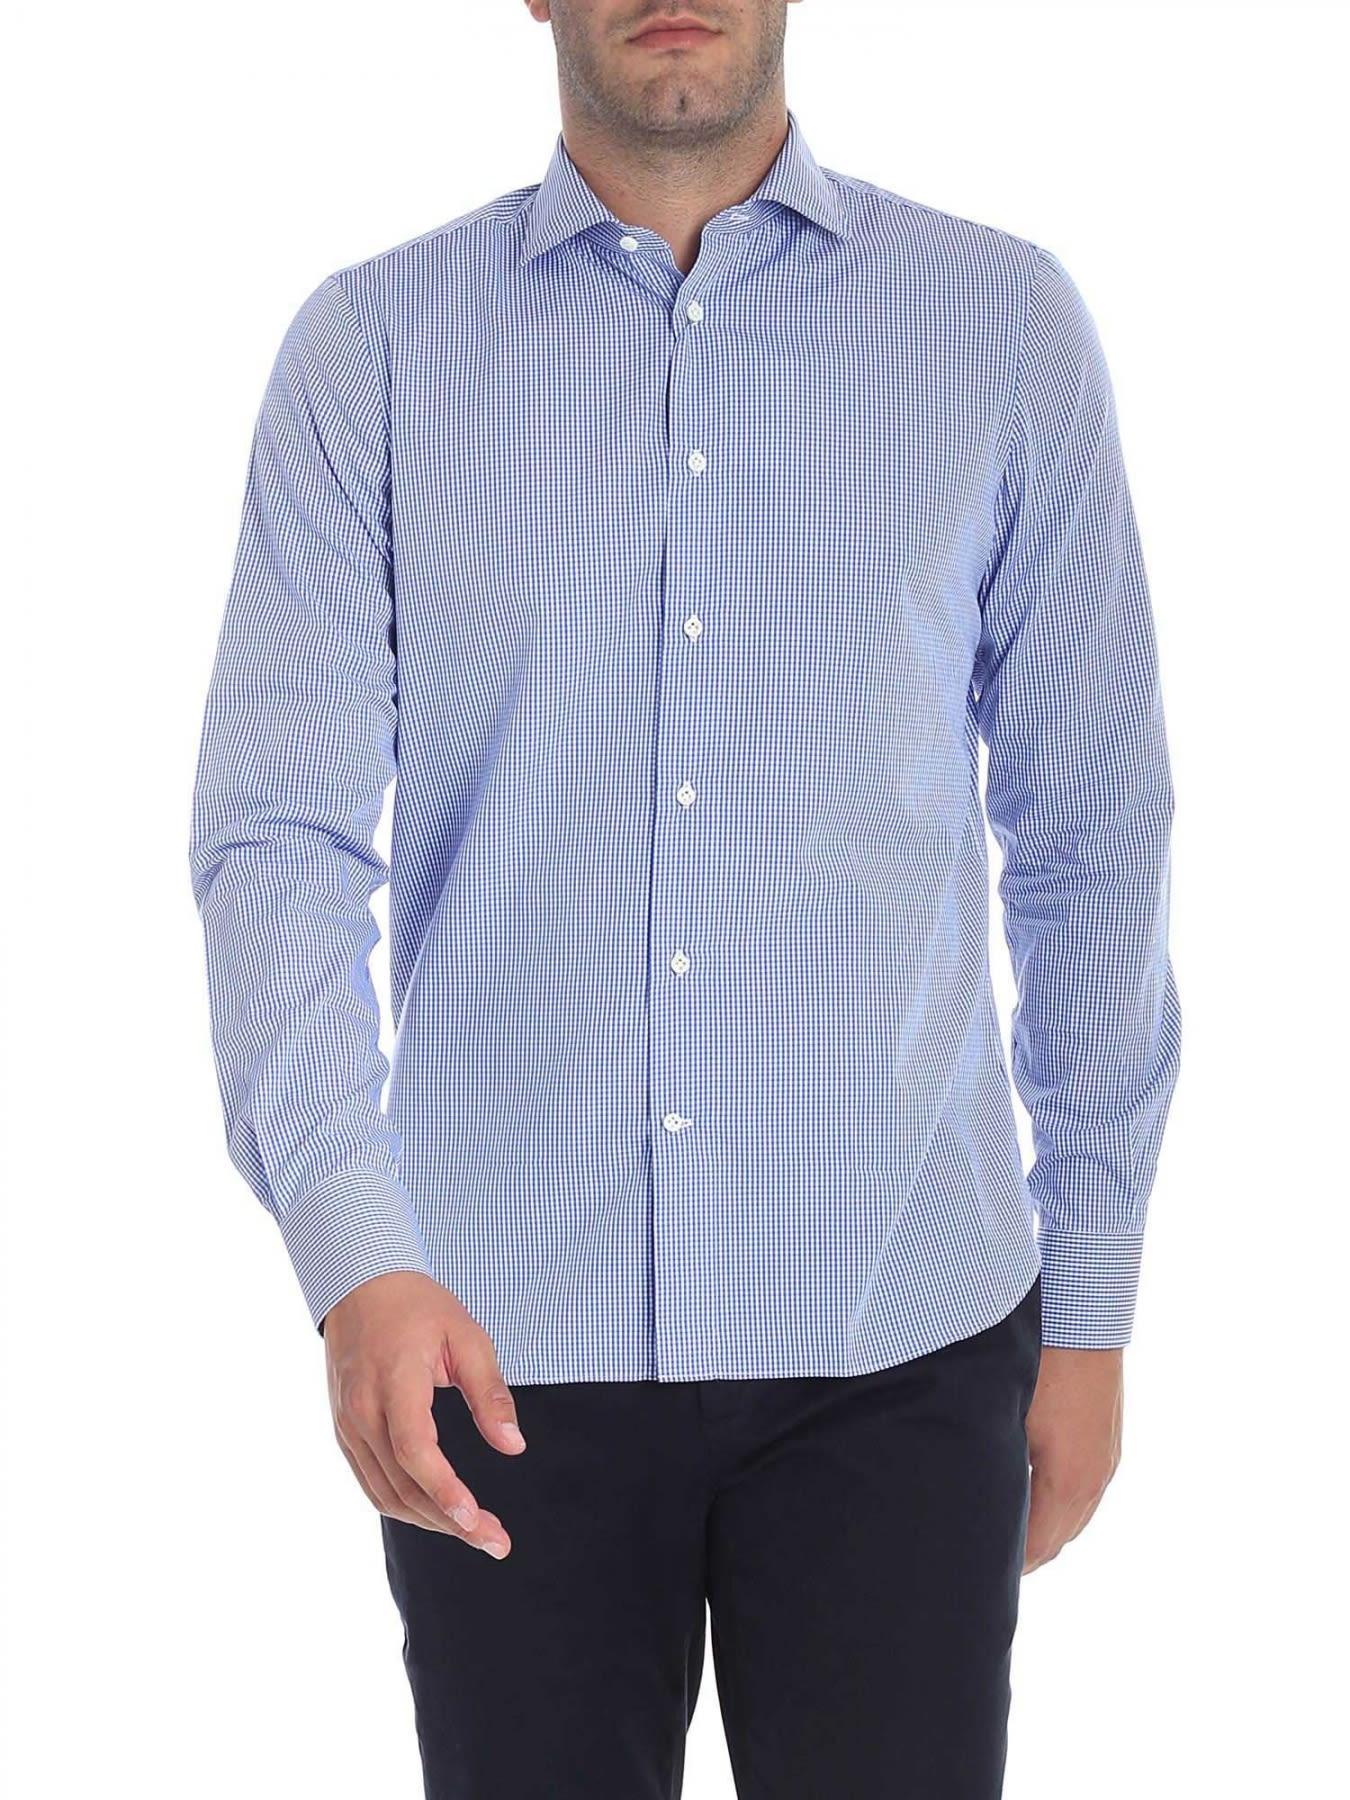 G. INGLESE Cotton Shirt in Light Blue